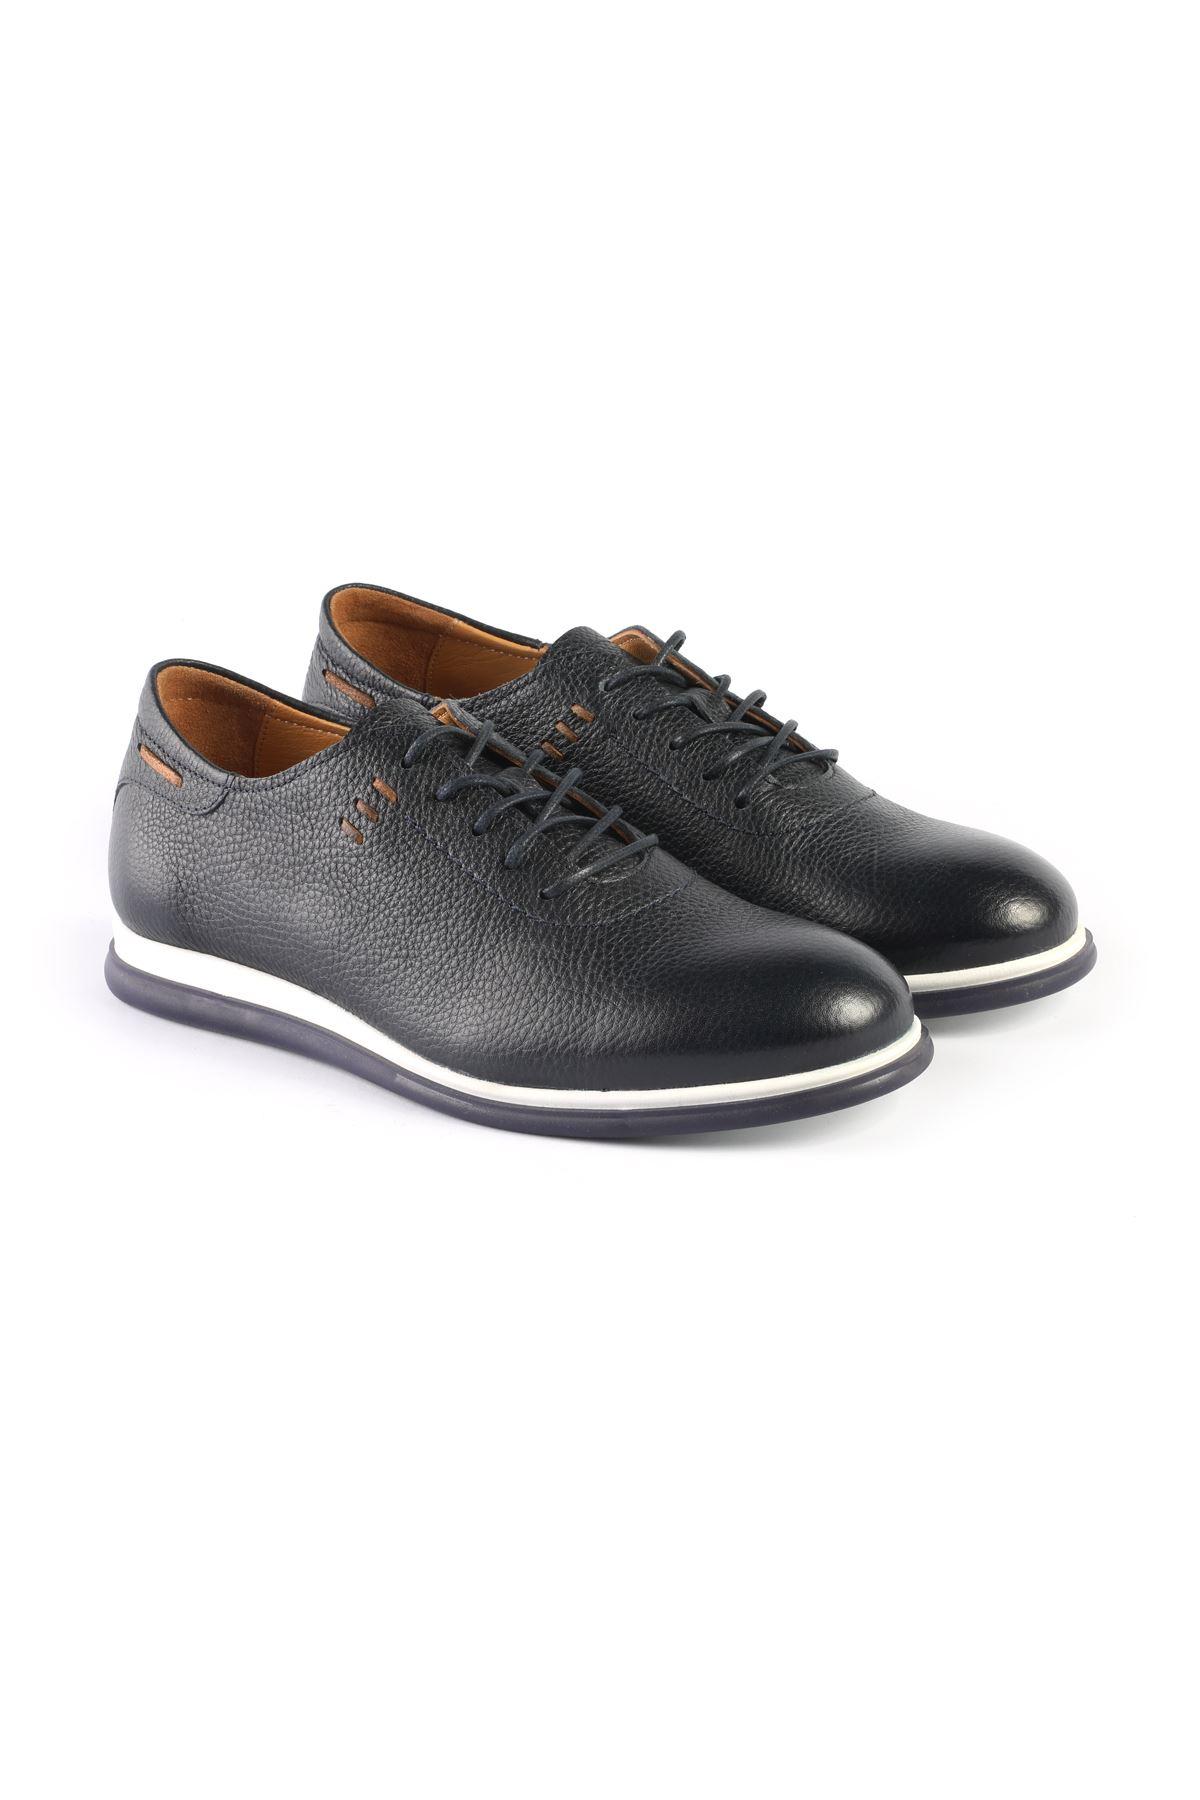 Libero L3276 Navy Blue Casual Shoes